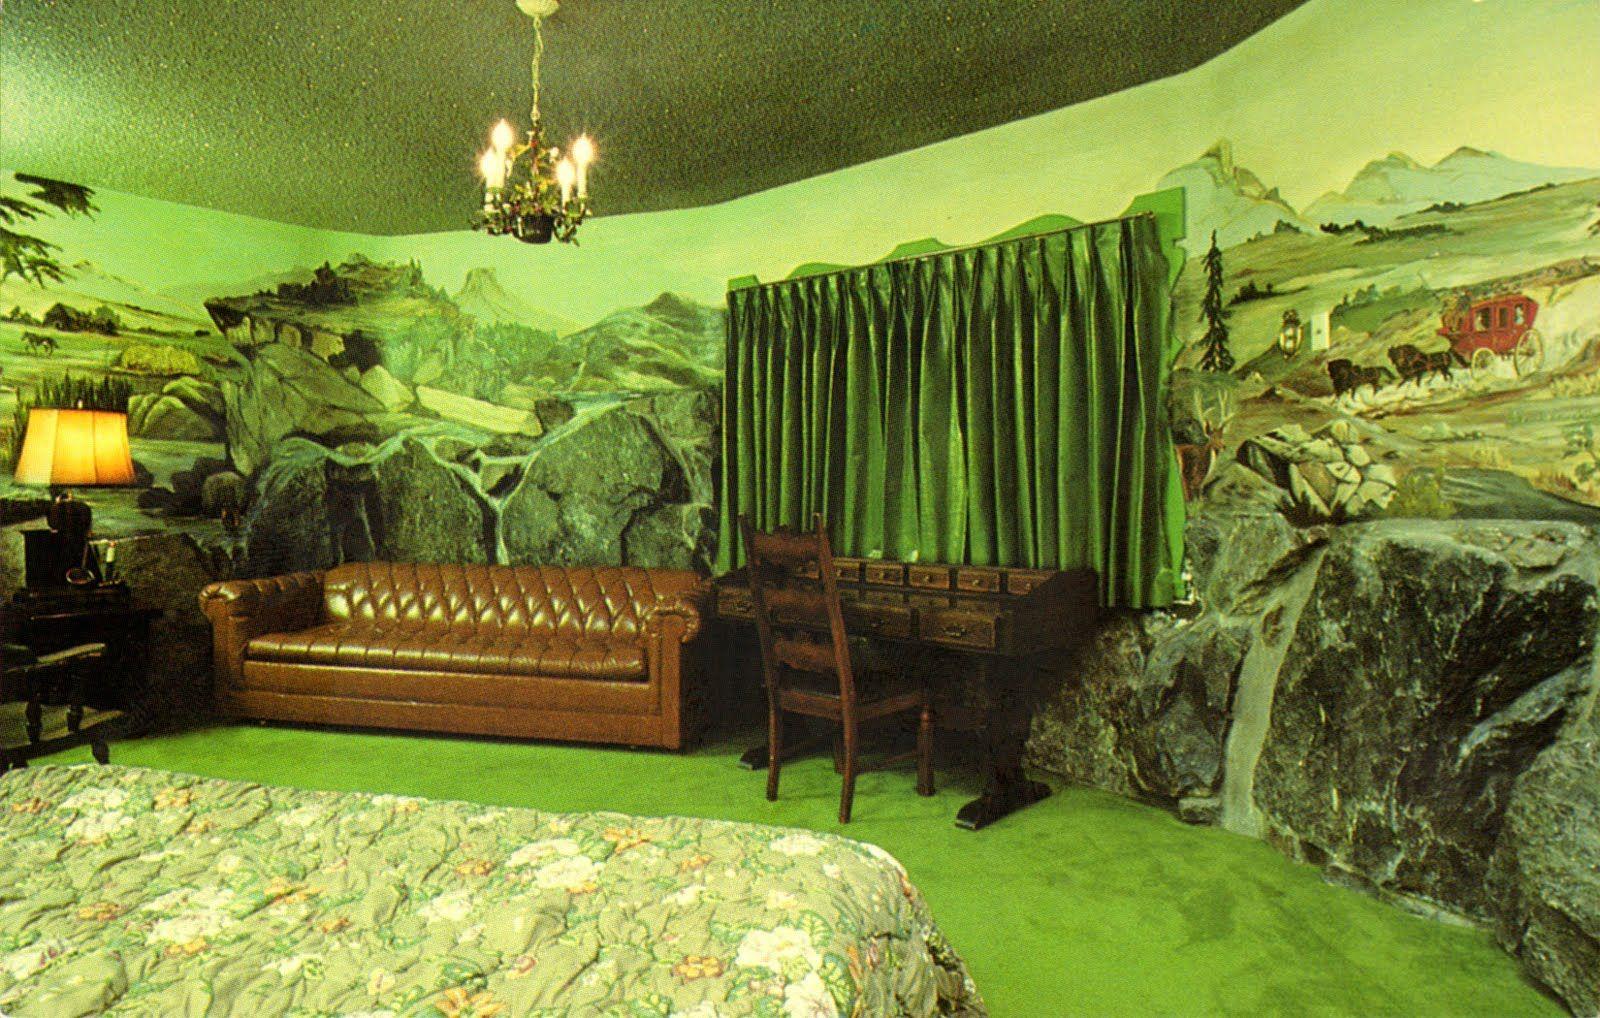 Madonna fashion show san luis obispo - Madonna Inn Room 178 Mountain Cabin San Luis Obispo Ca